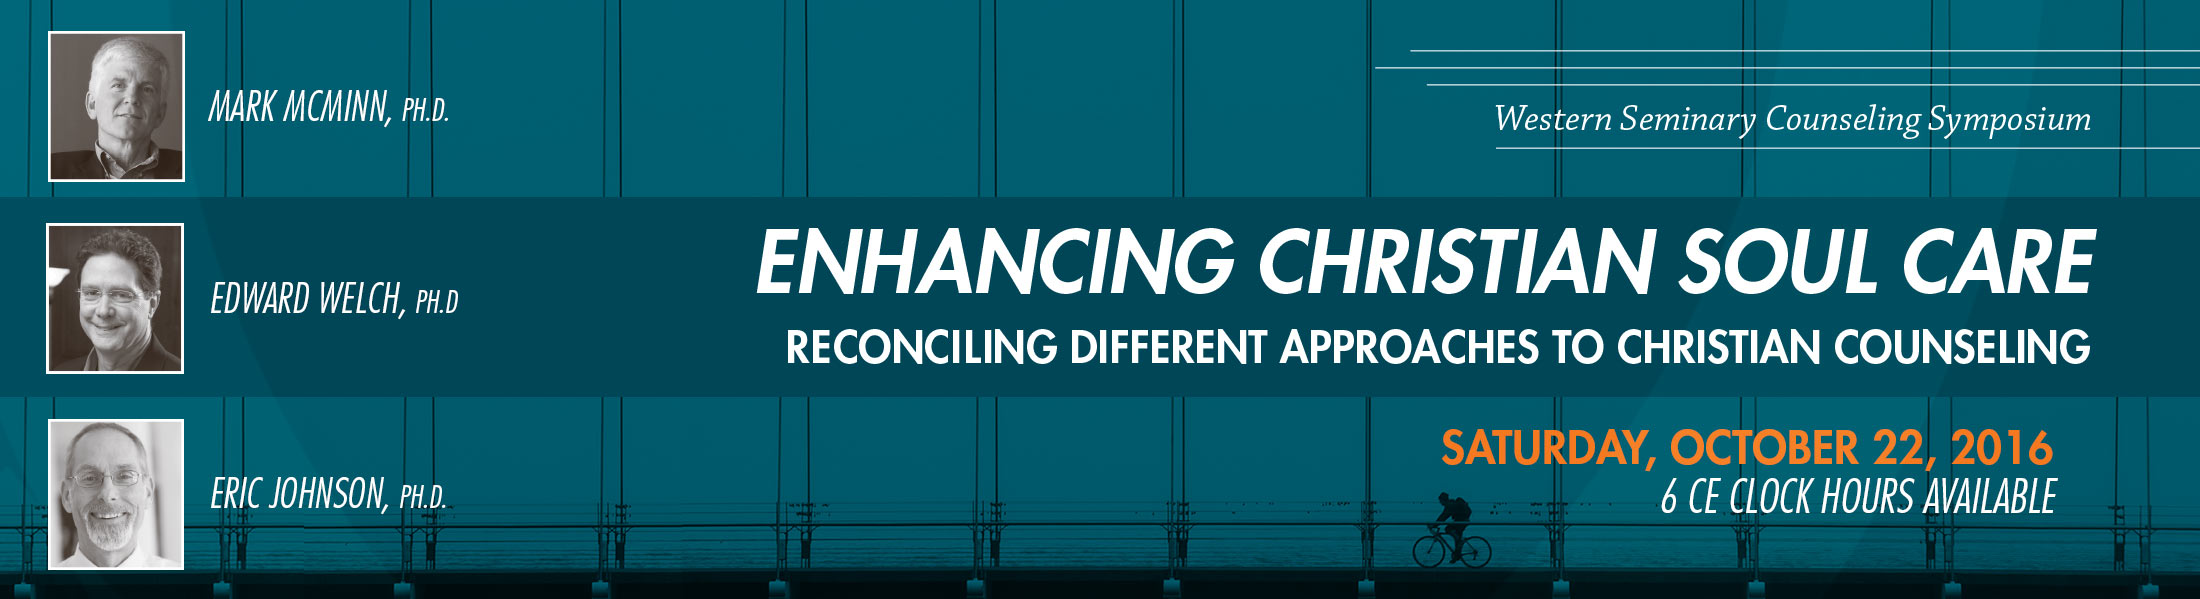 Enhancing Christian Soul Care